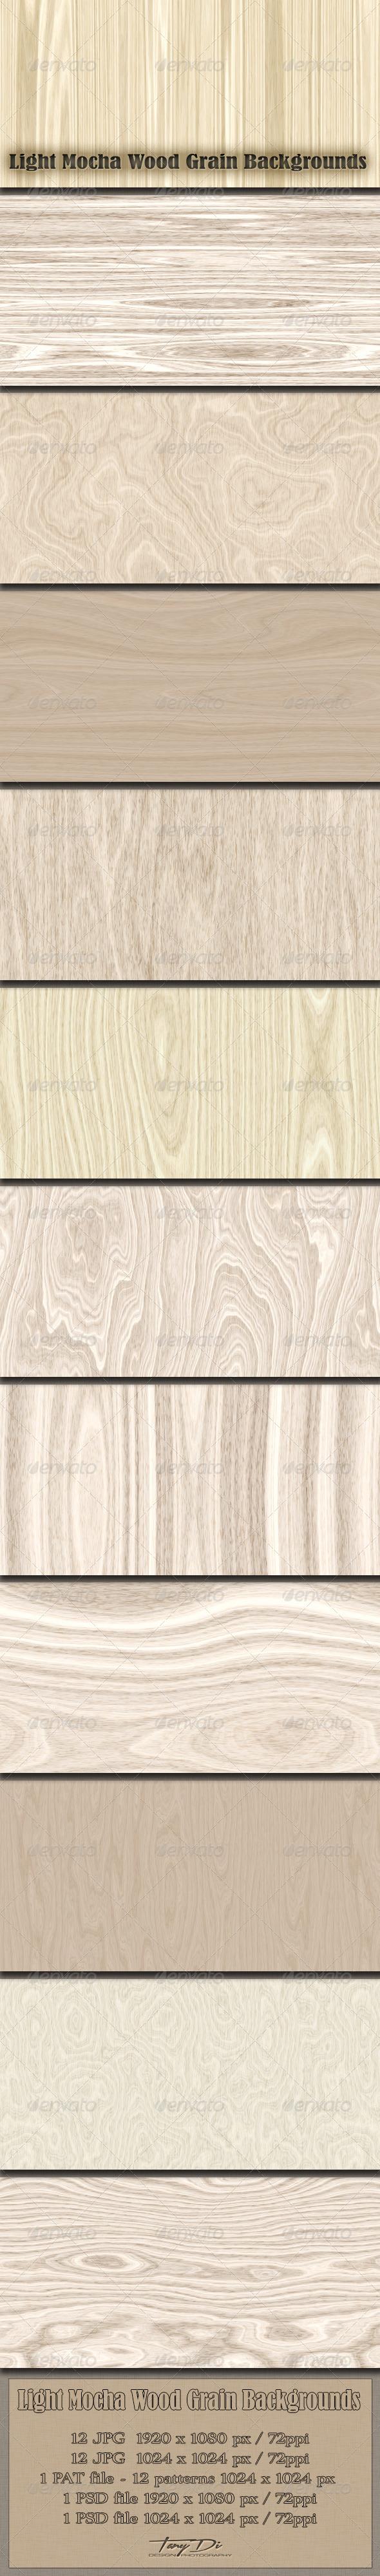 GraphicRiver Light Mocha Wood Grain Patterns 6198473